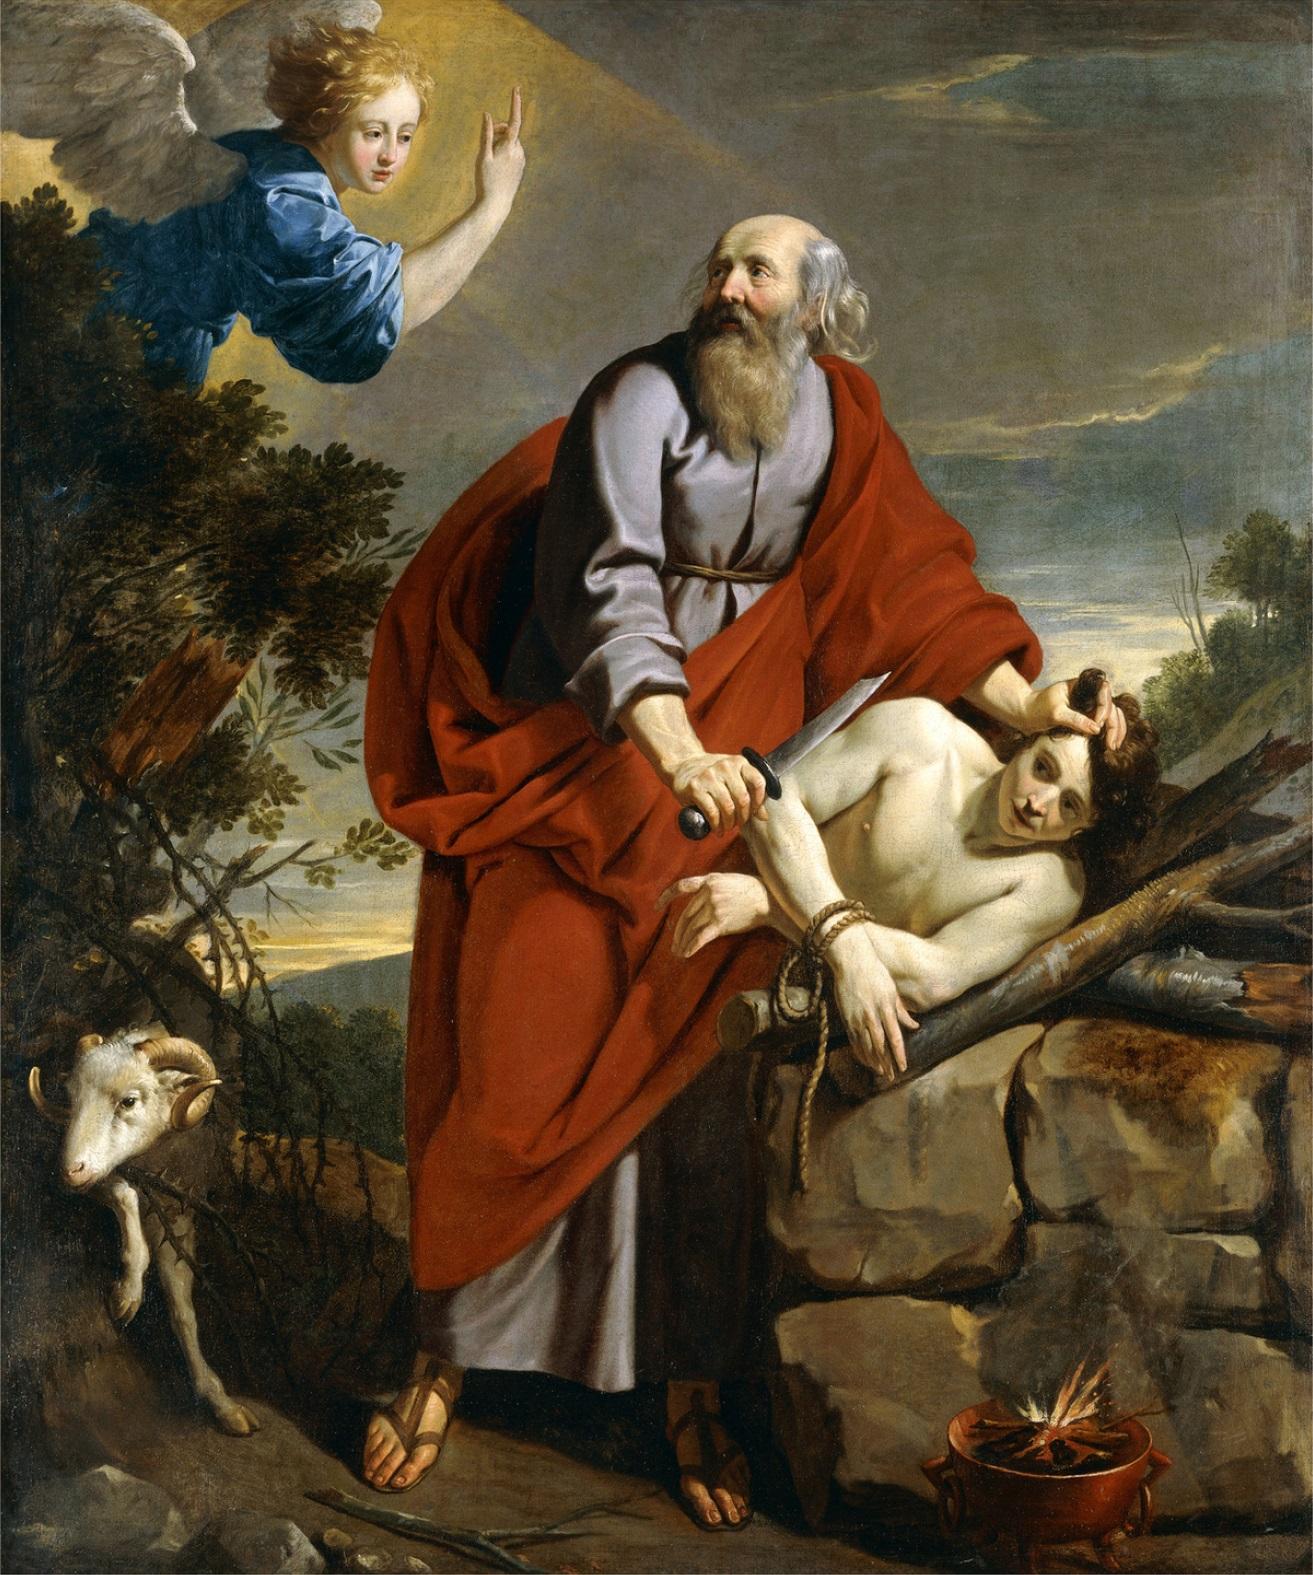 Historia de Moisés